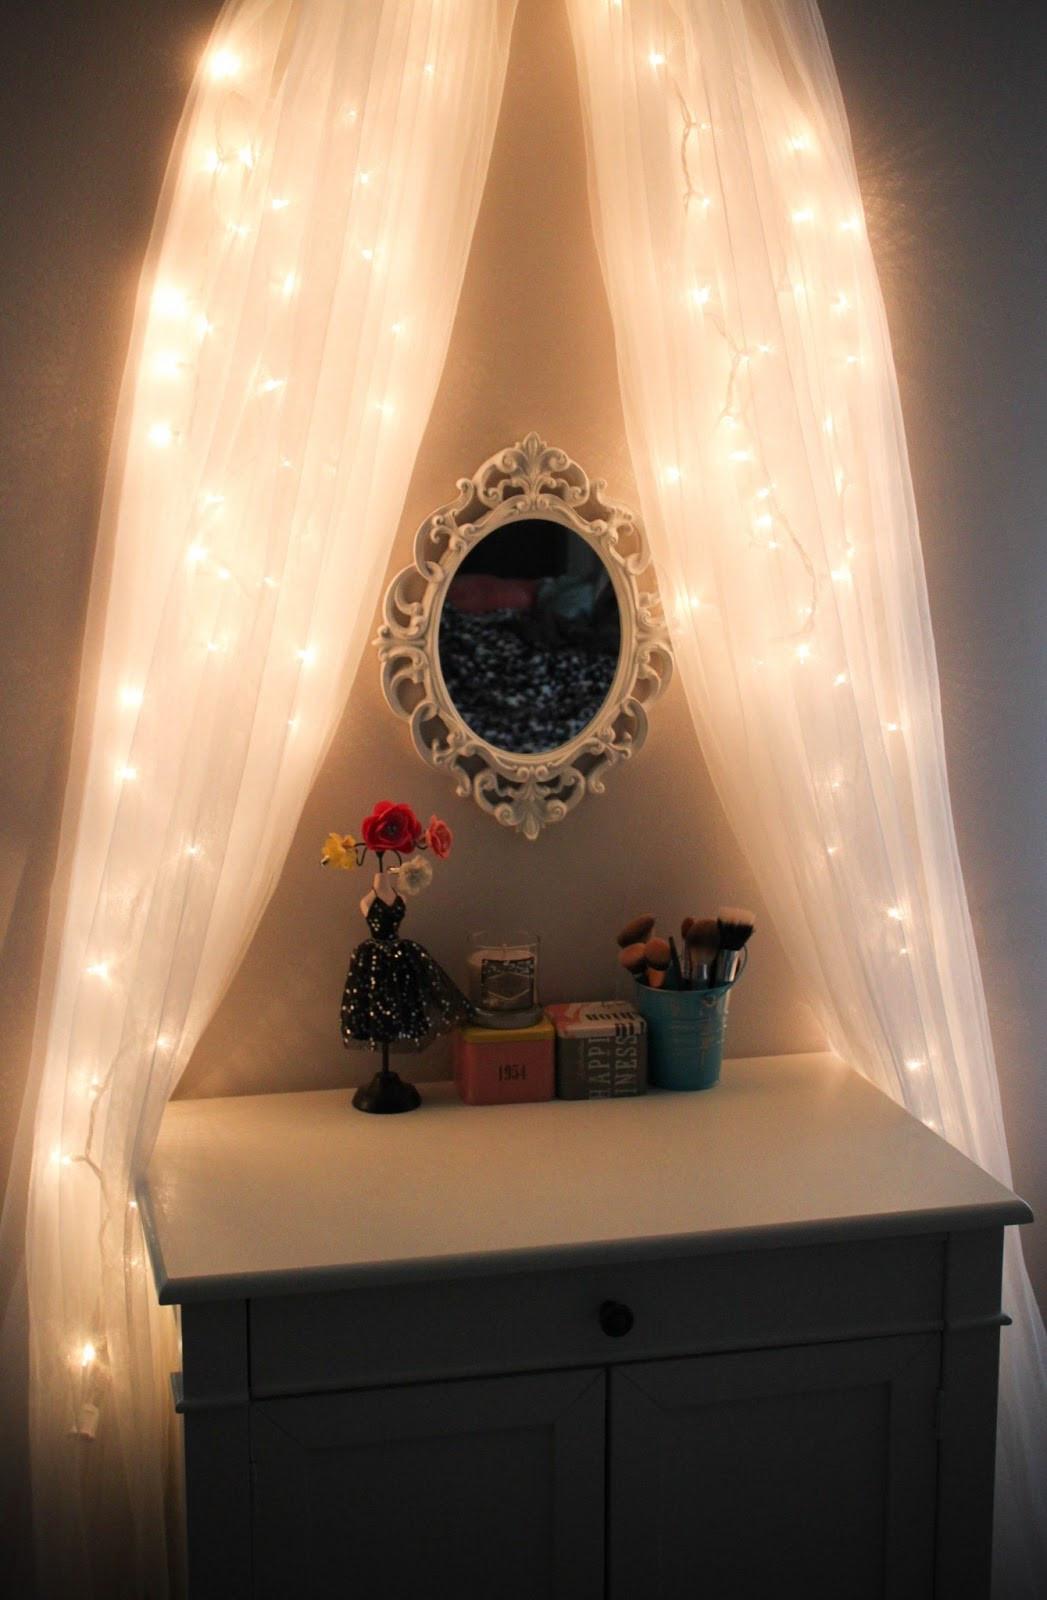 Best ideas about DIY Makeup Vanity Lighting . Save or Pin Leslie Loves Makeup DIY Fairy Light Vanity Area ♥ [original] Now.